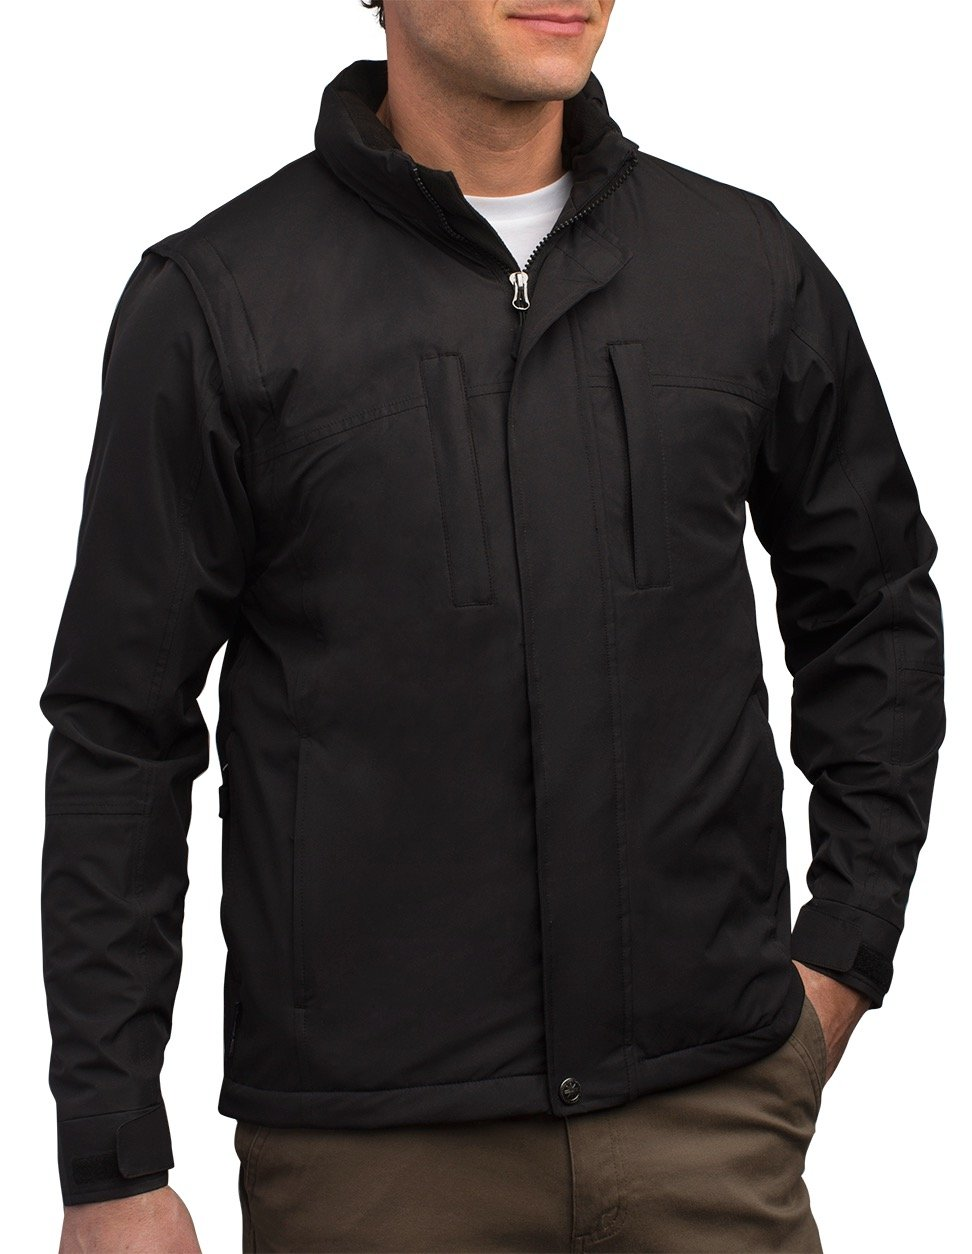 SCOTTeVEST Revolution - 26 Pockets - Travel Clothing, Pickpocket Proof XL